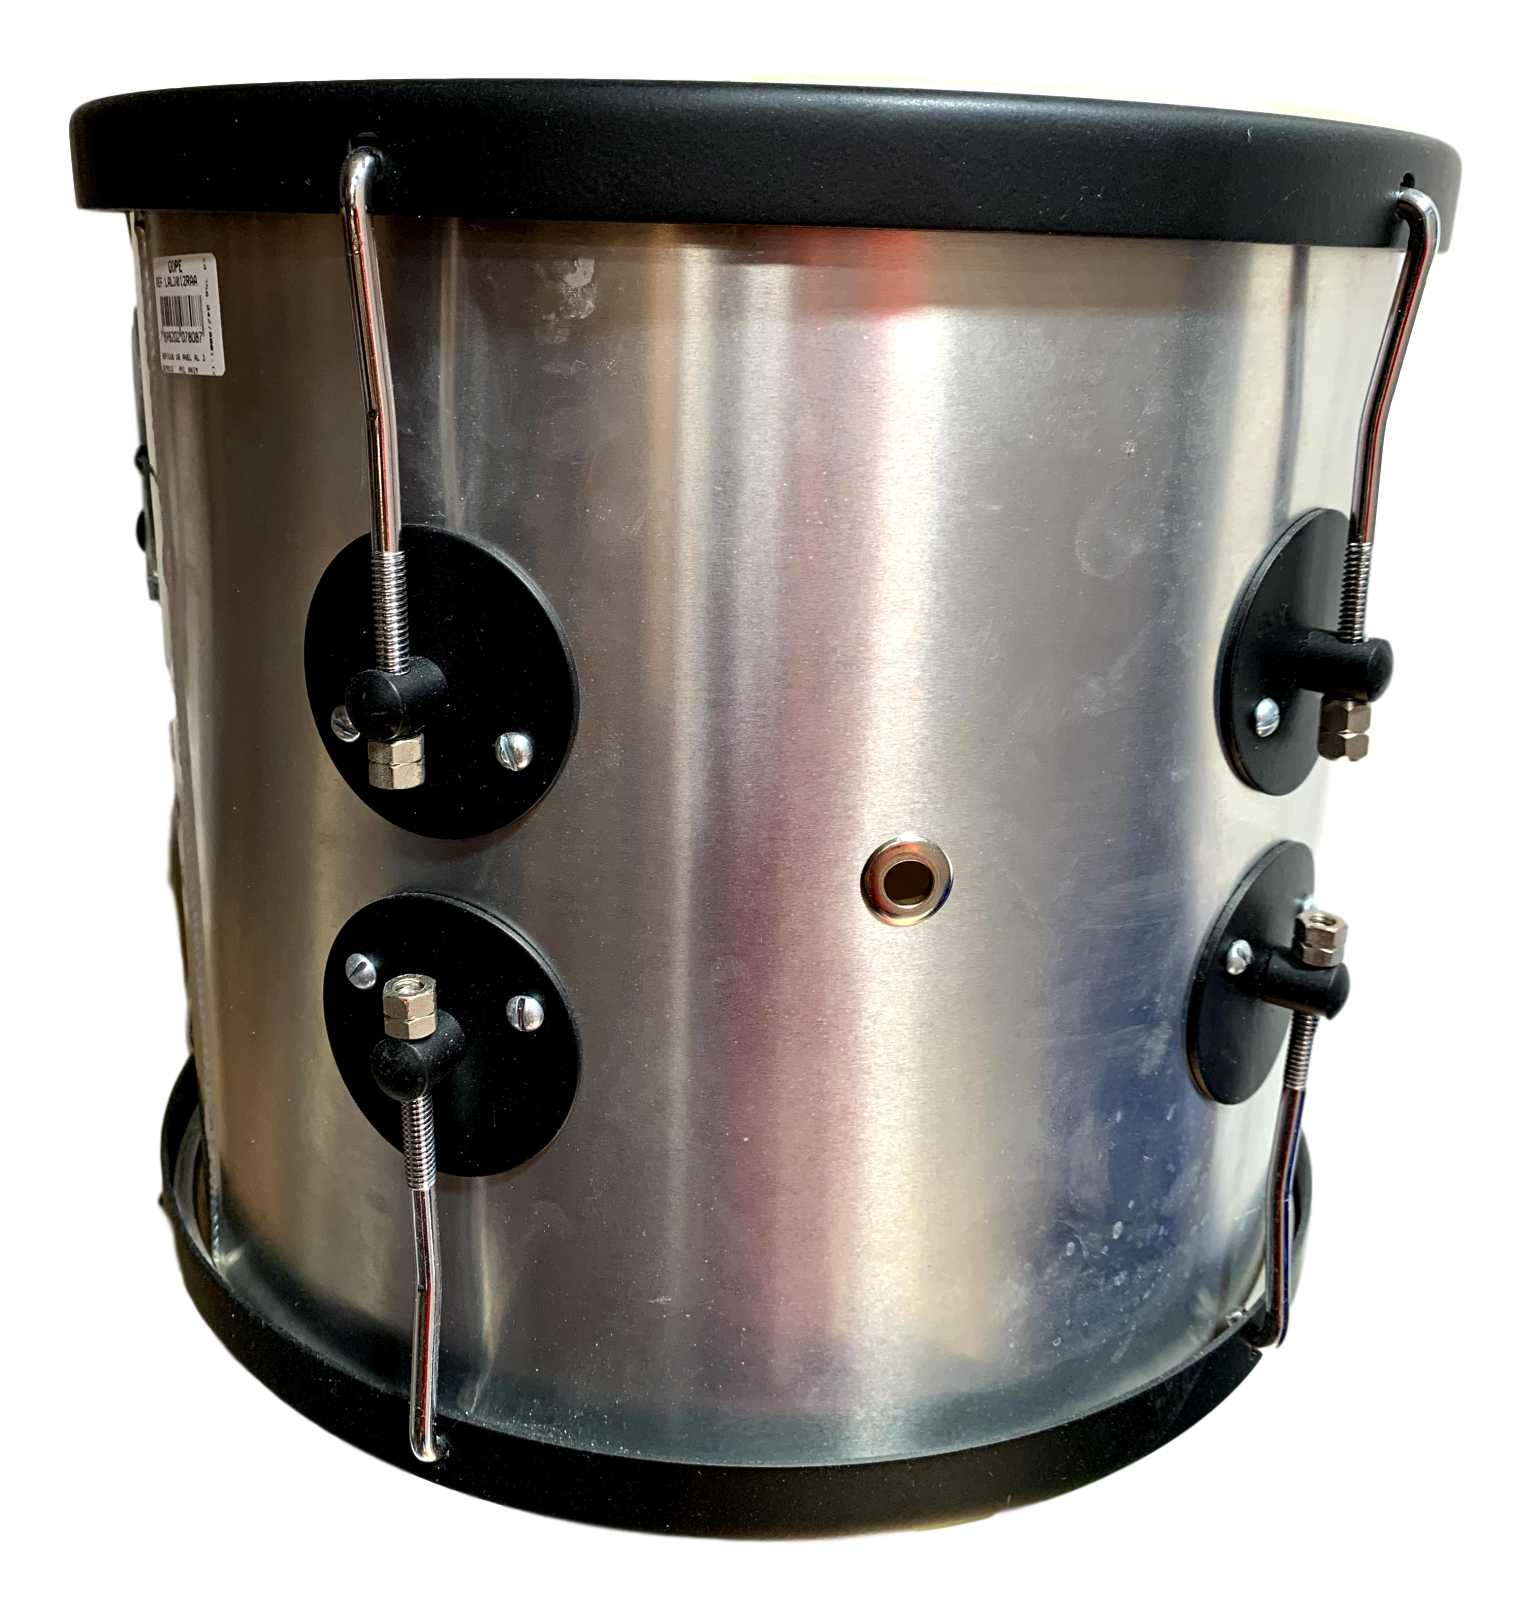 Repique de Anel Gope 12 pol Aluminio